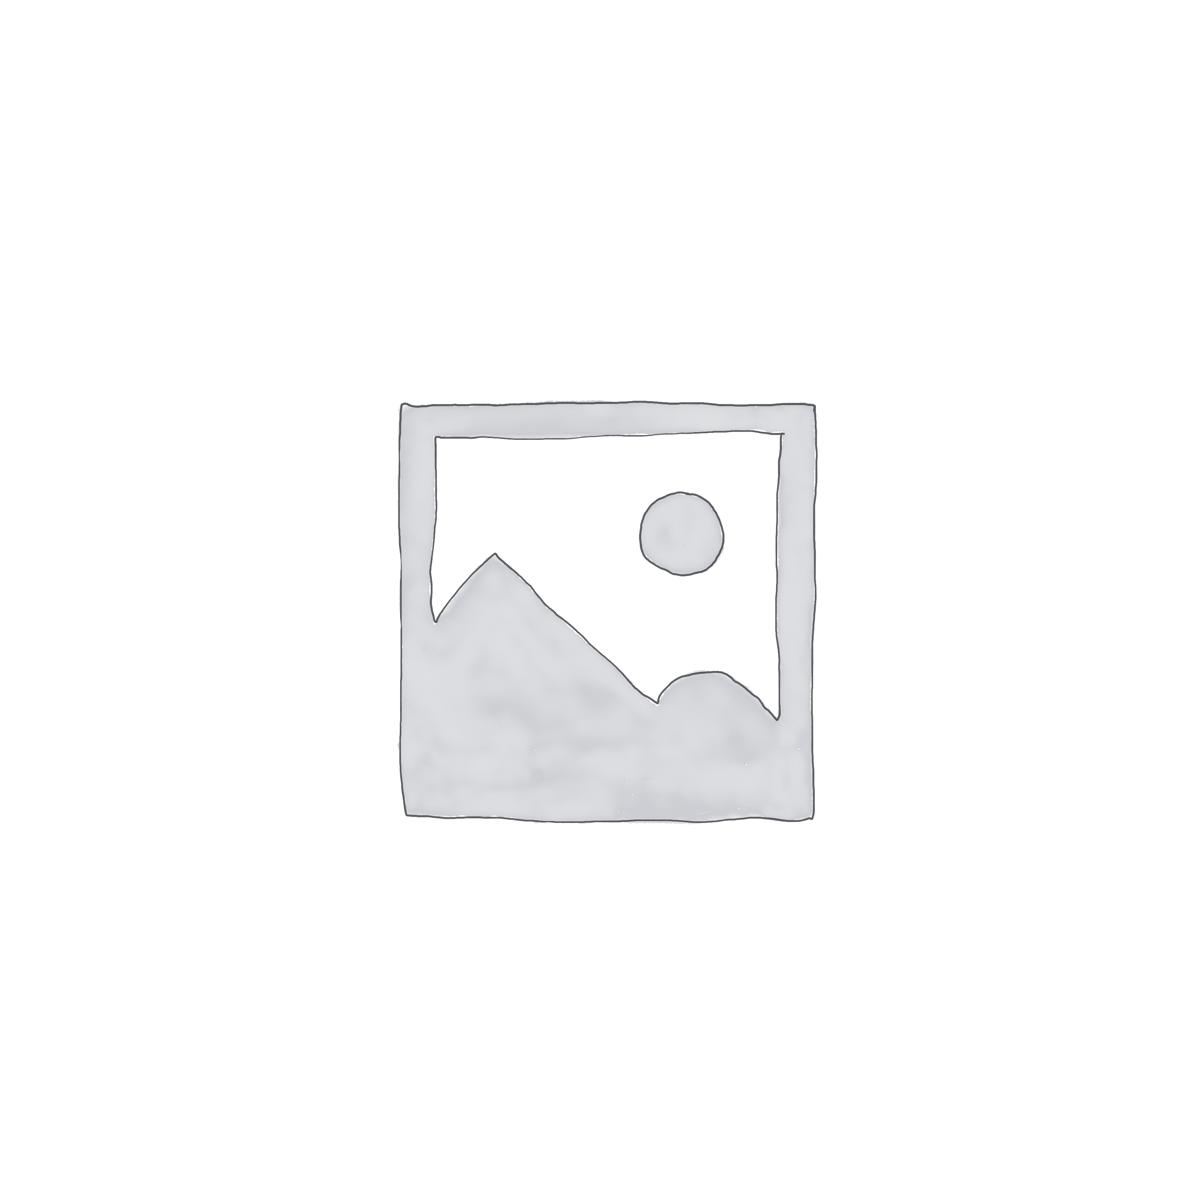 Monochrome Floral Drawing Art Wallpaper Mural